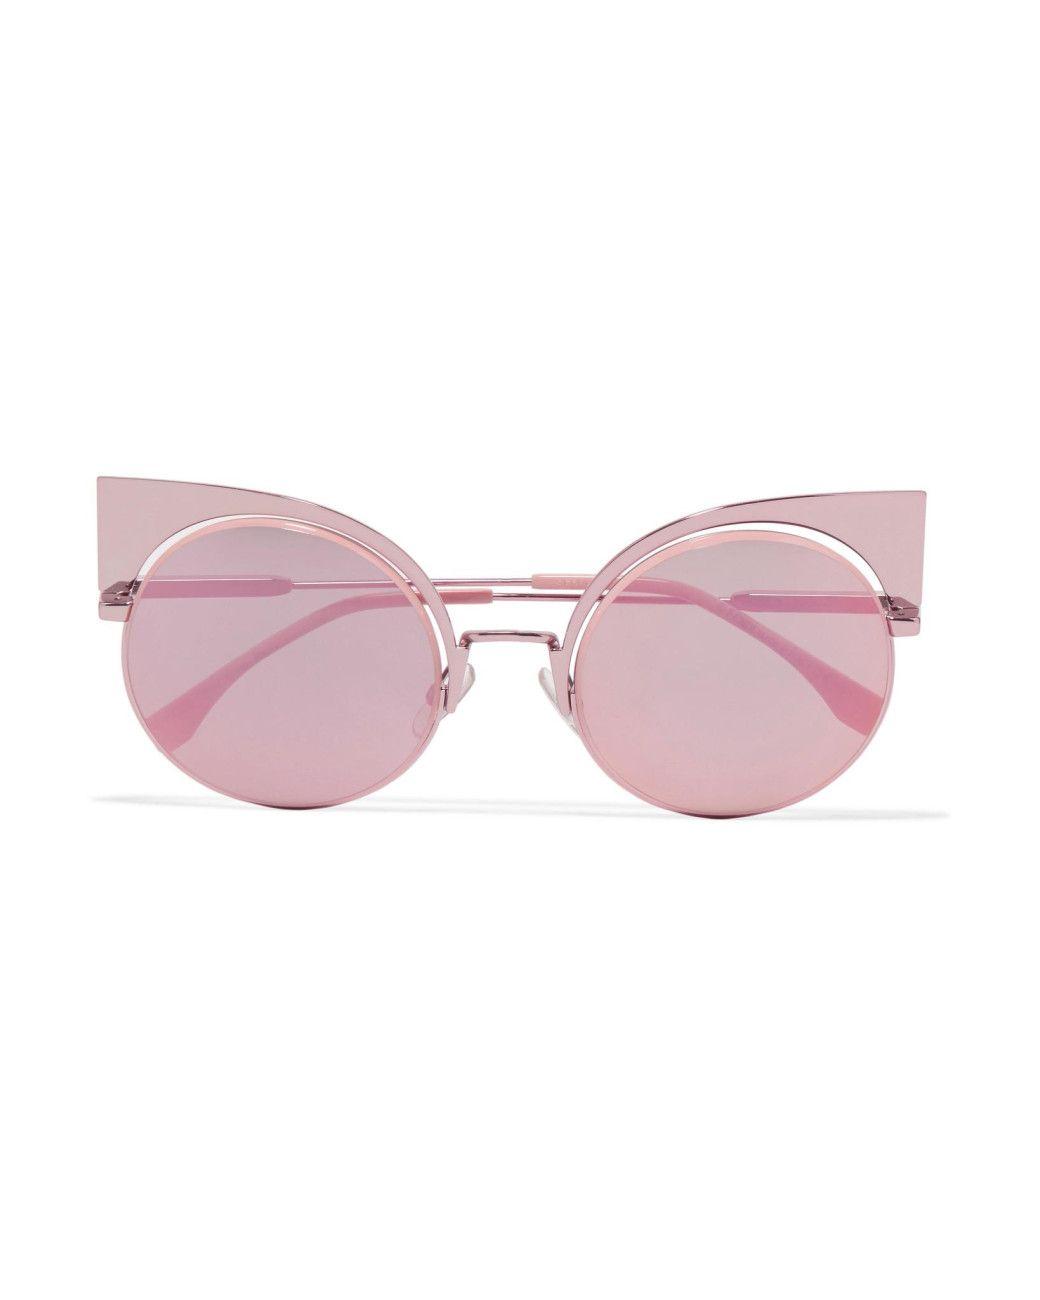 0e82b90509be Women s Pink Cat-eye Metal Mirrored Sunglasses